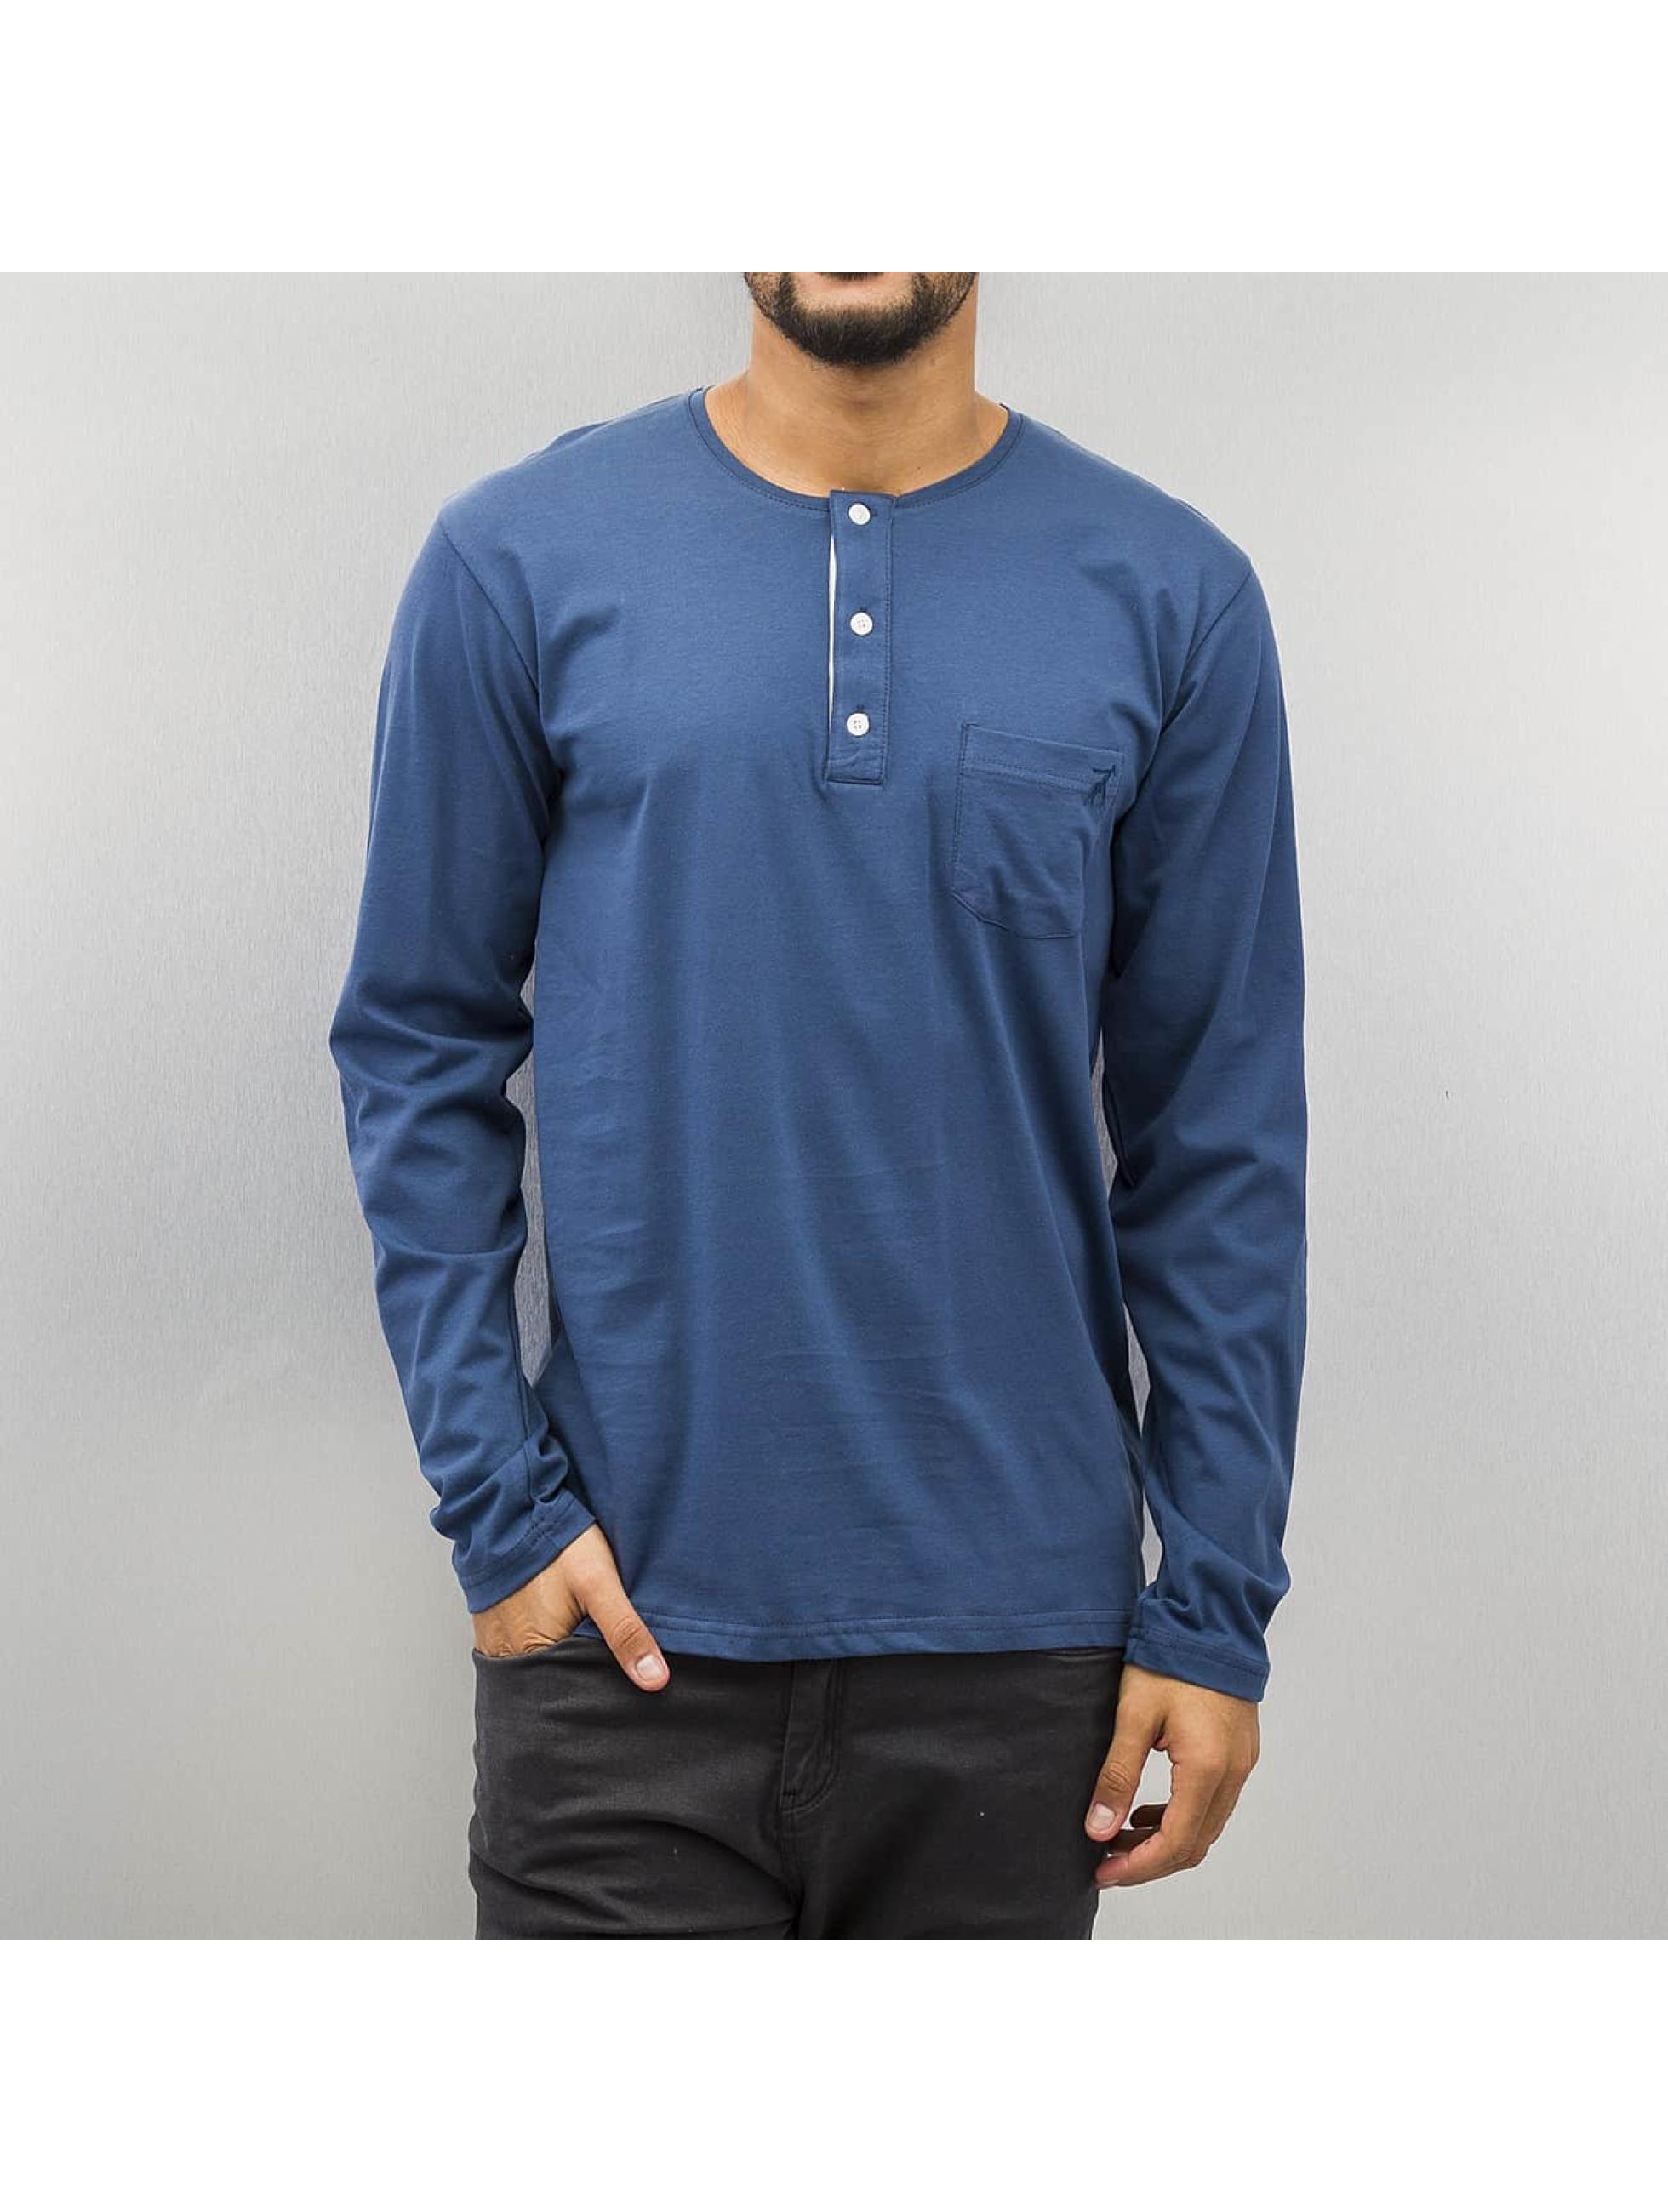 Cazzy Clang / Longsleeve Padua in blue L